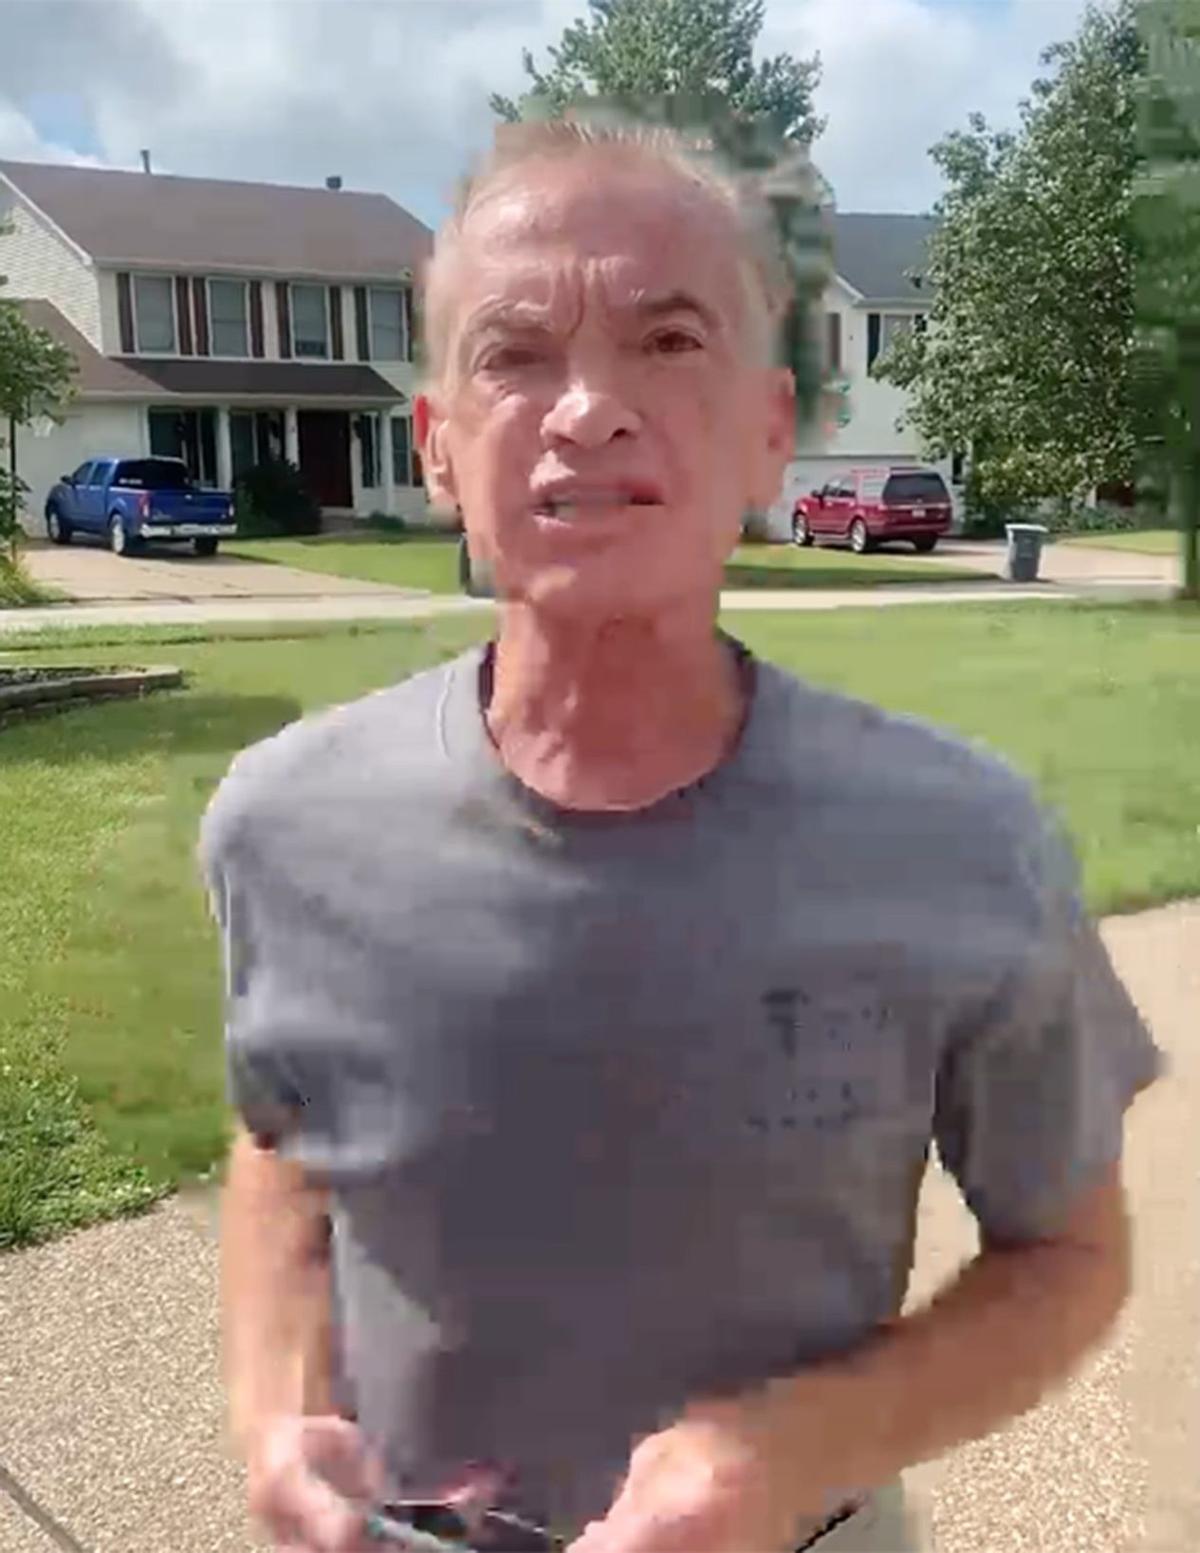 O'FAllon, Missouri man verbally assaults health worker